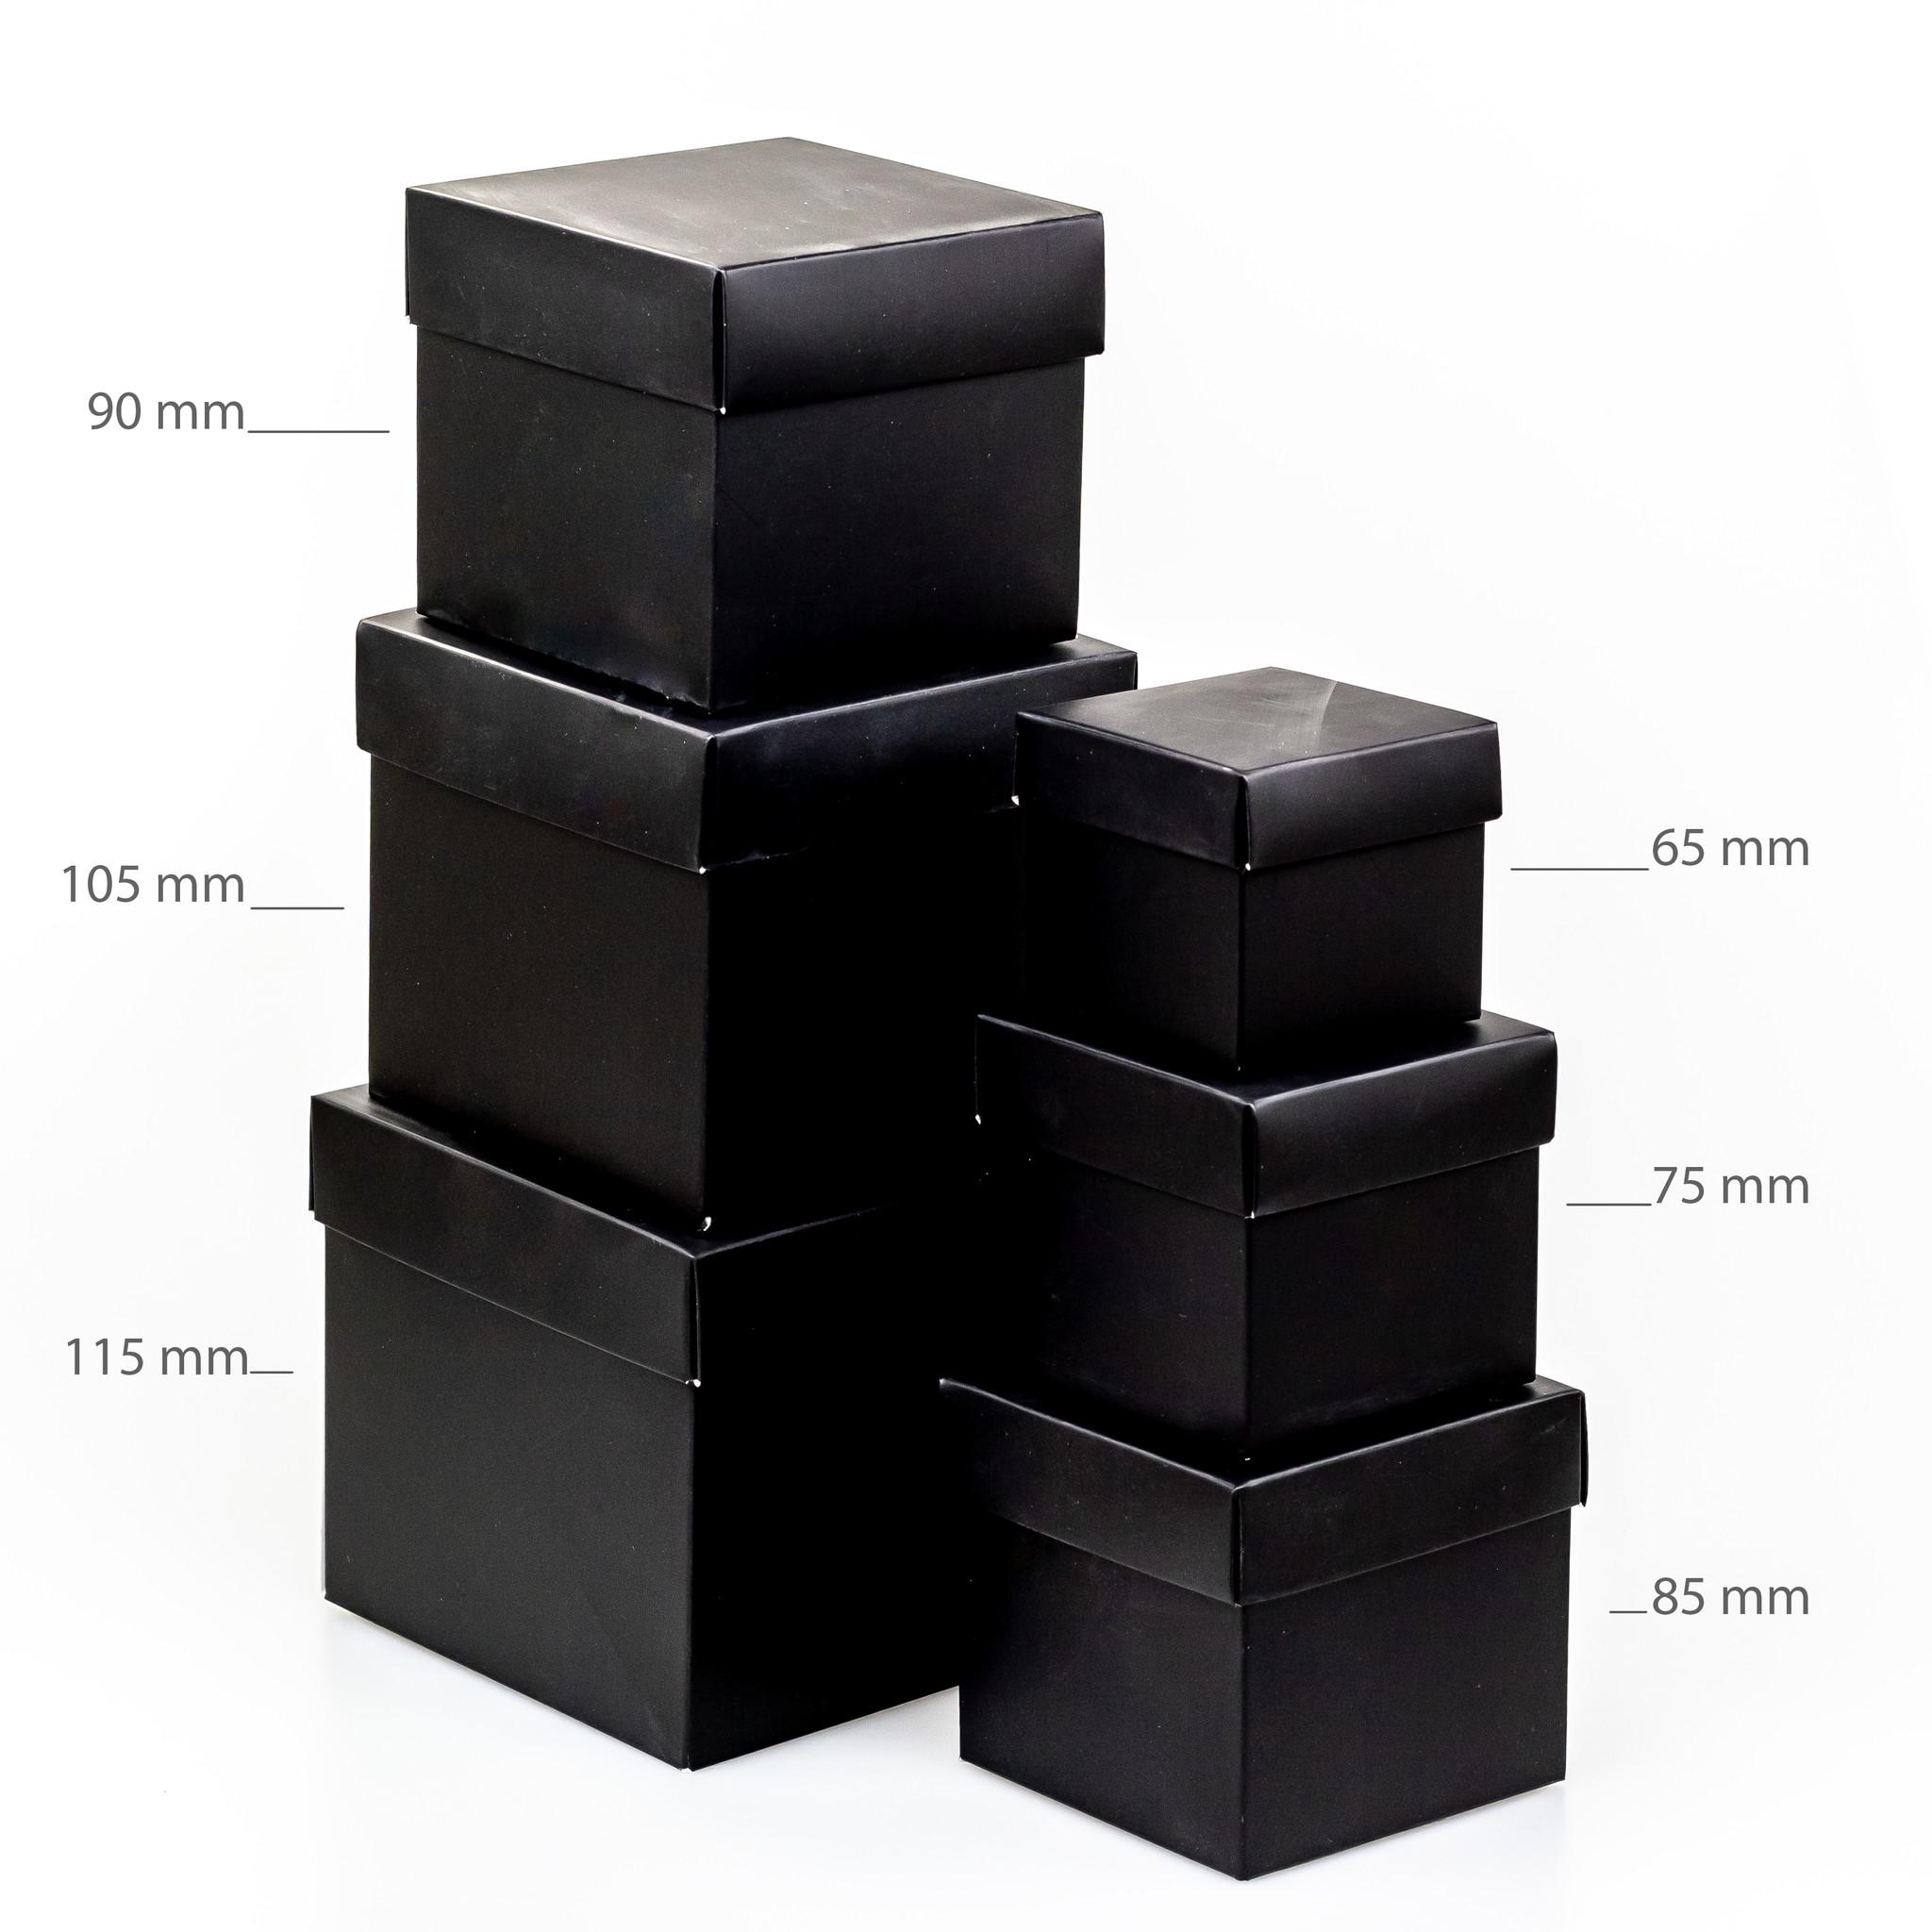 Cubebox - Malva